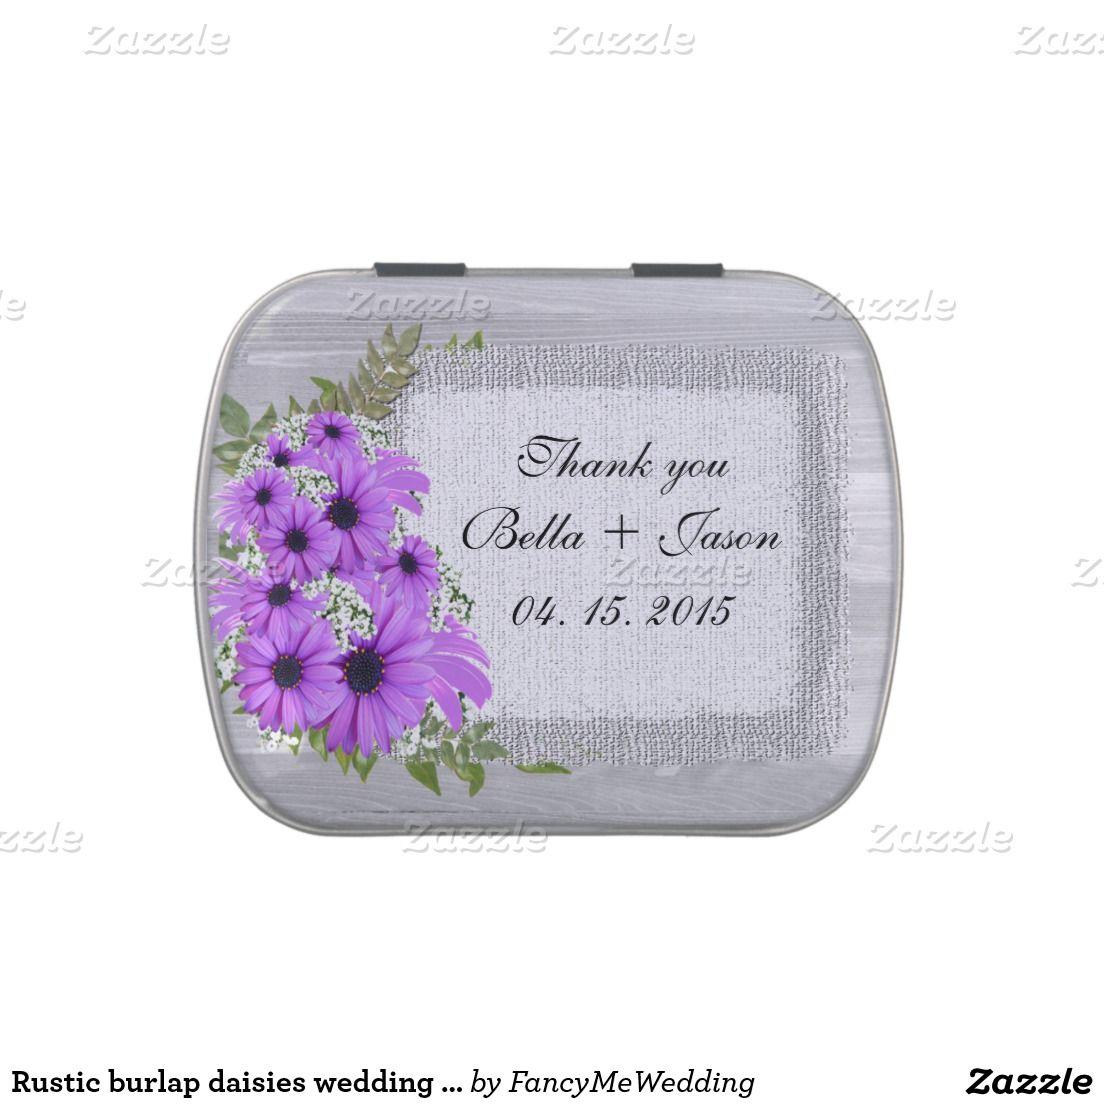 Rustic burlap daisies wedding favors daisy4 candy tin   Bridal ...